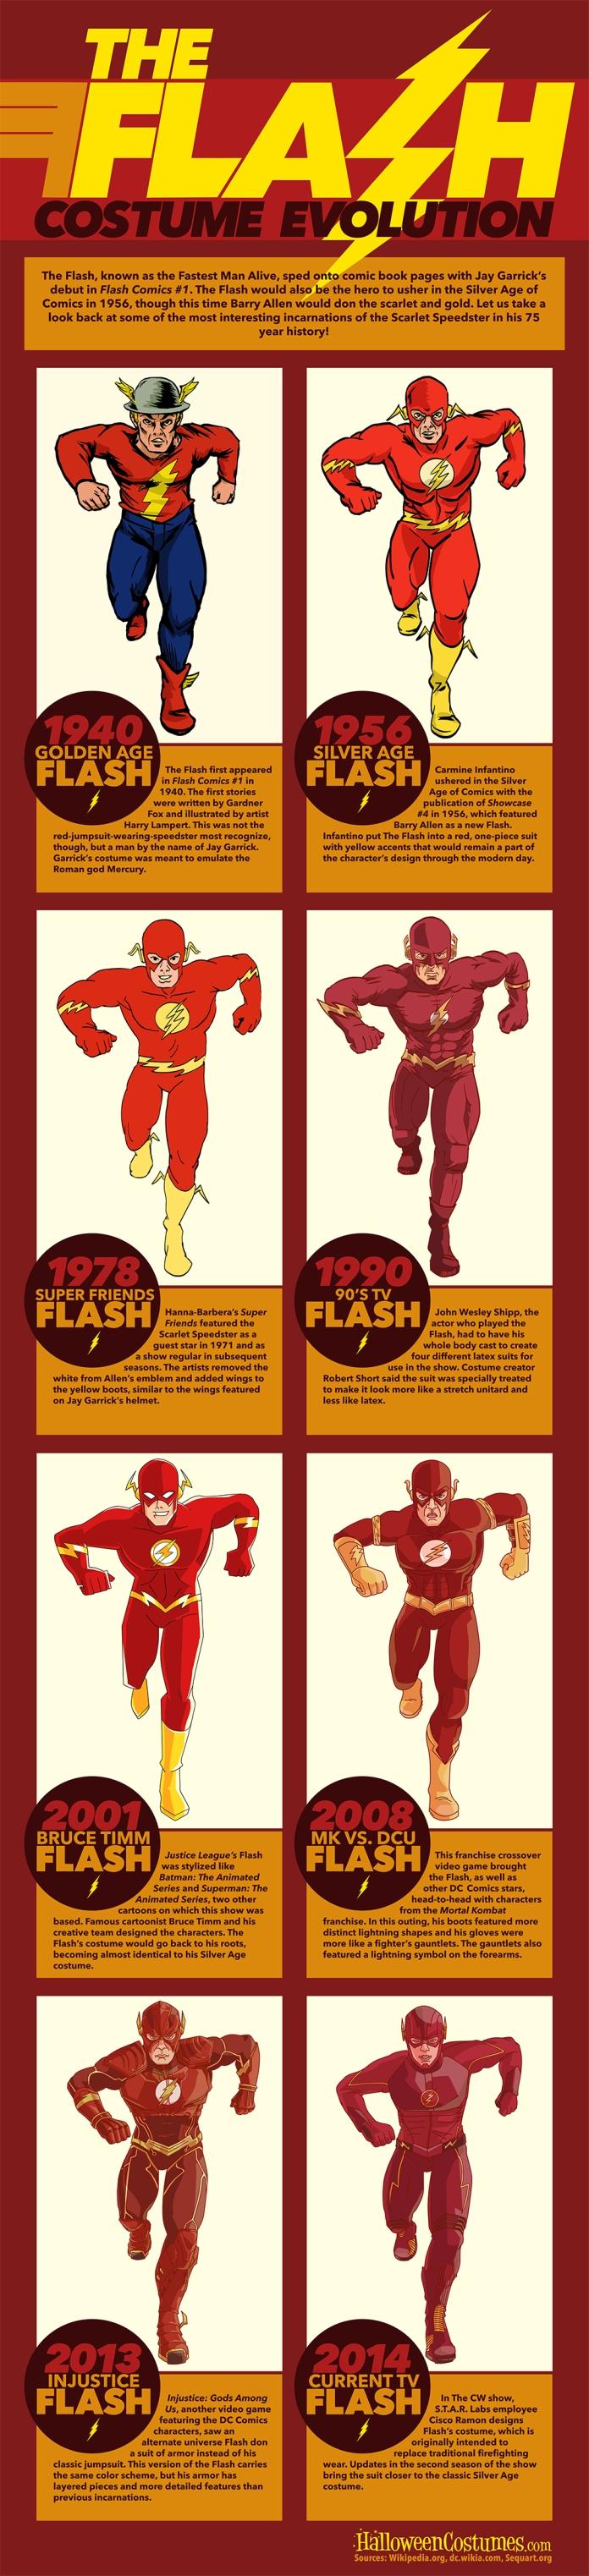 flash-costumes